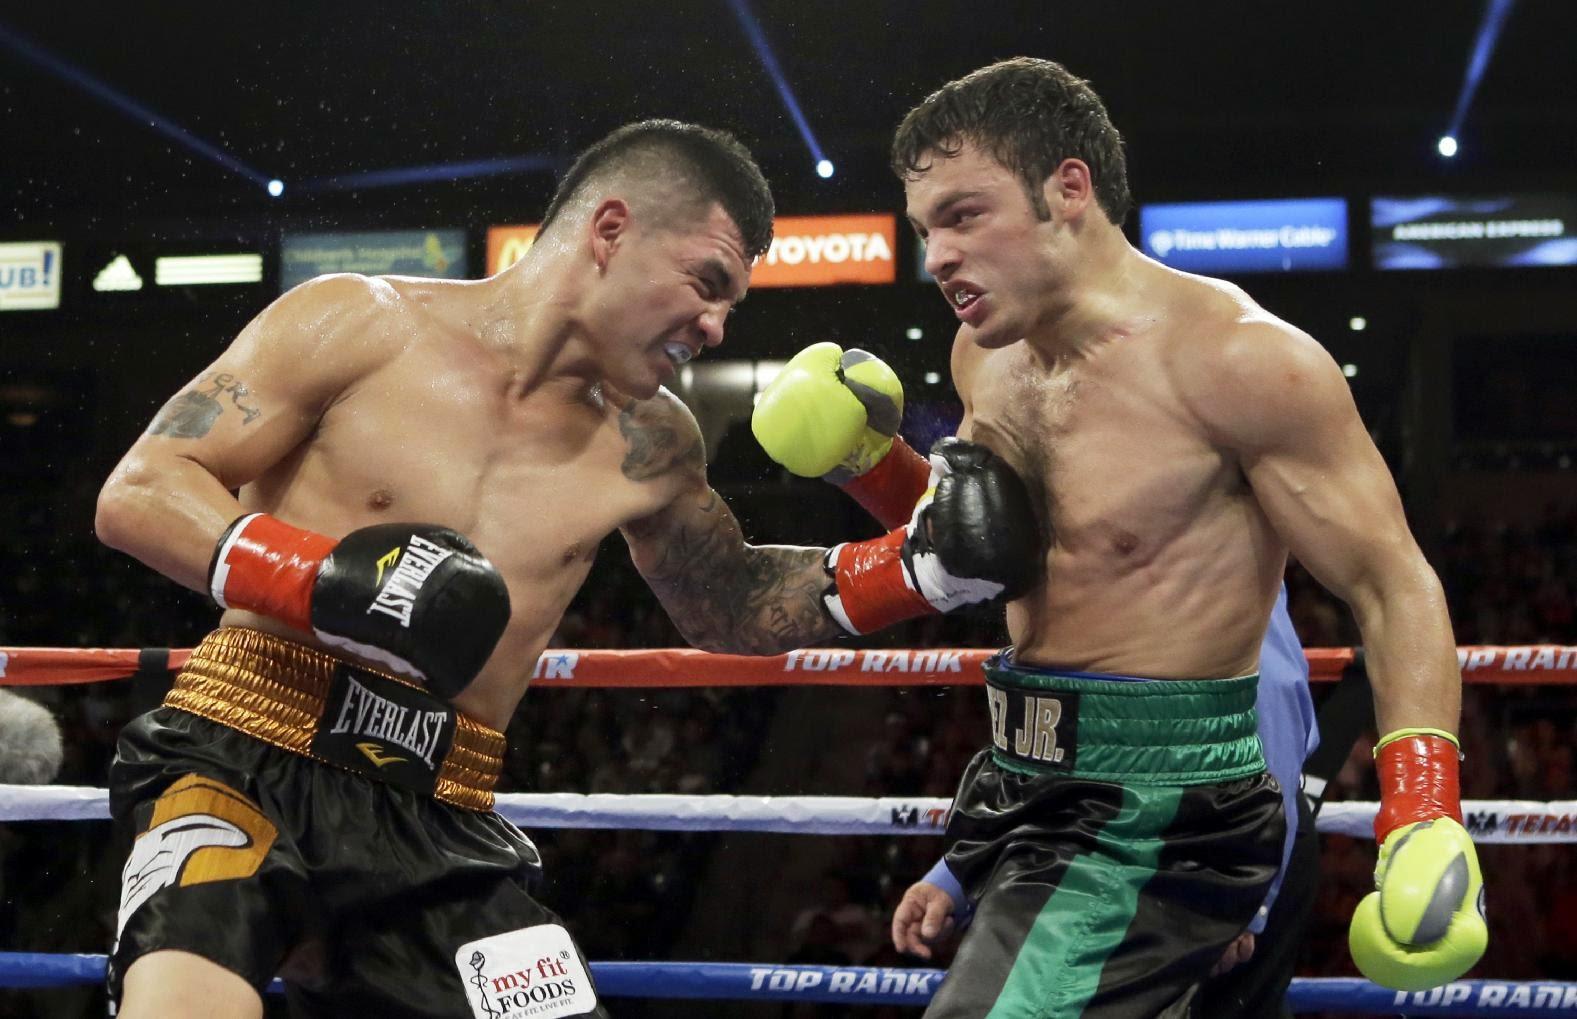 Giovanni De Carolis vs. Dominik Britsch live Boxing on 30 May 2014